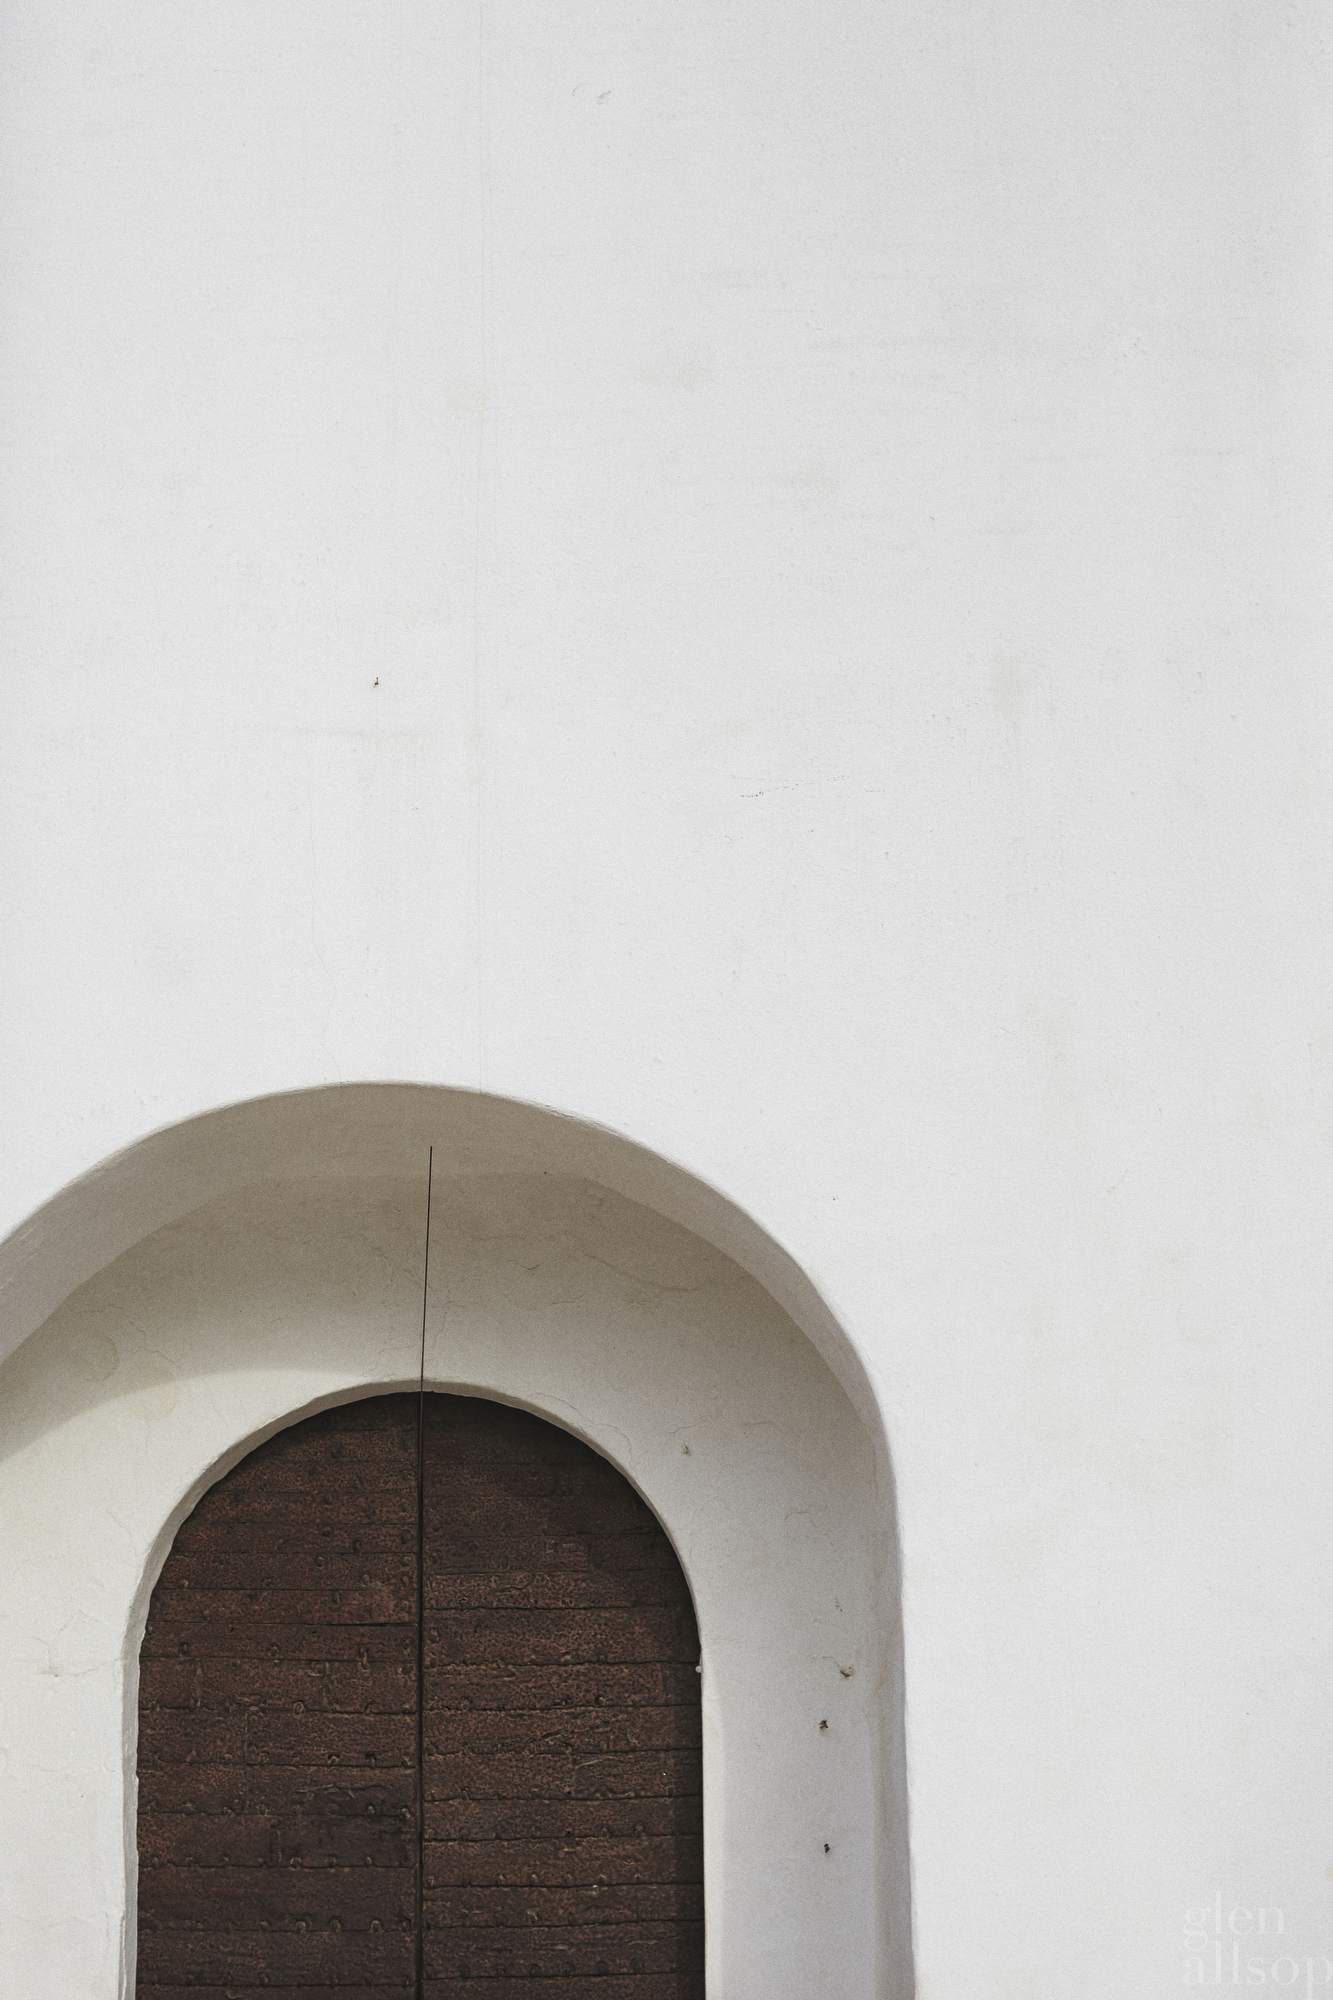 formentera-spain-eidos-church door-minimal